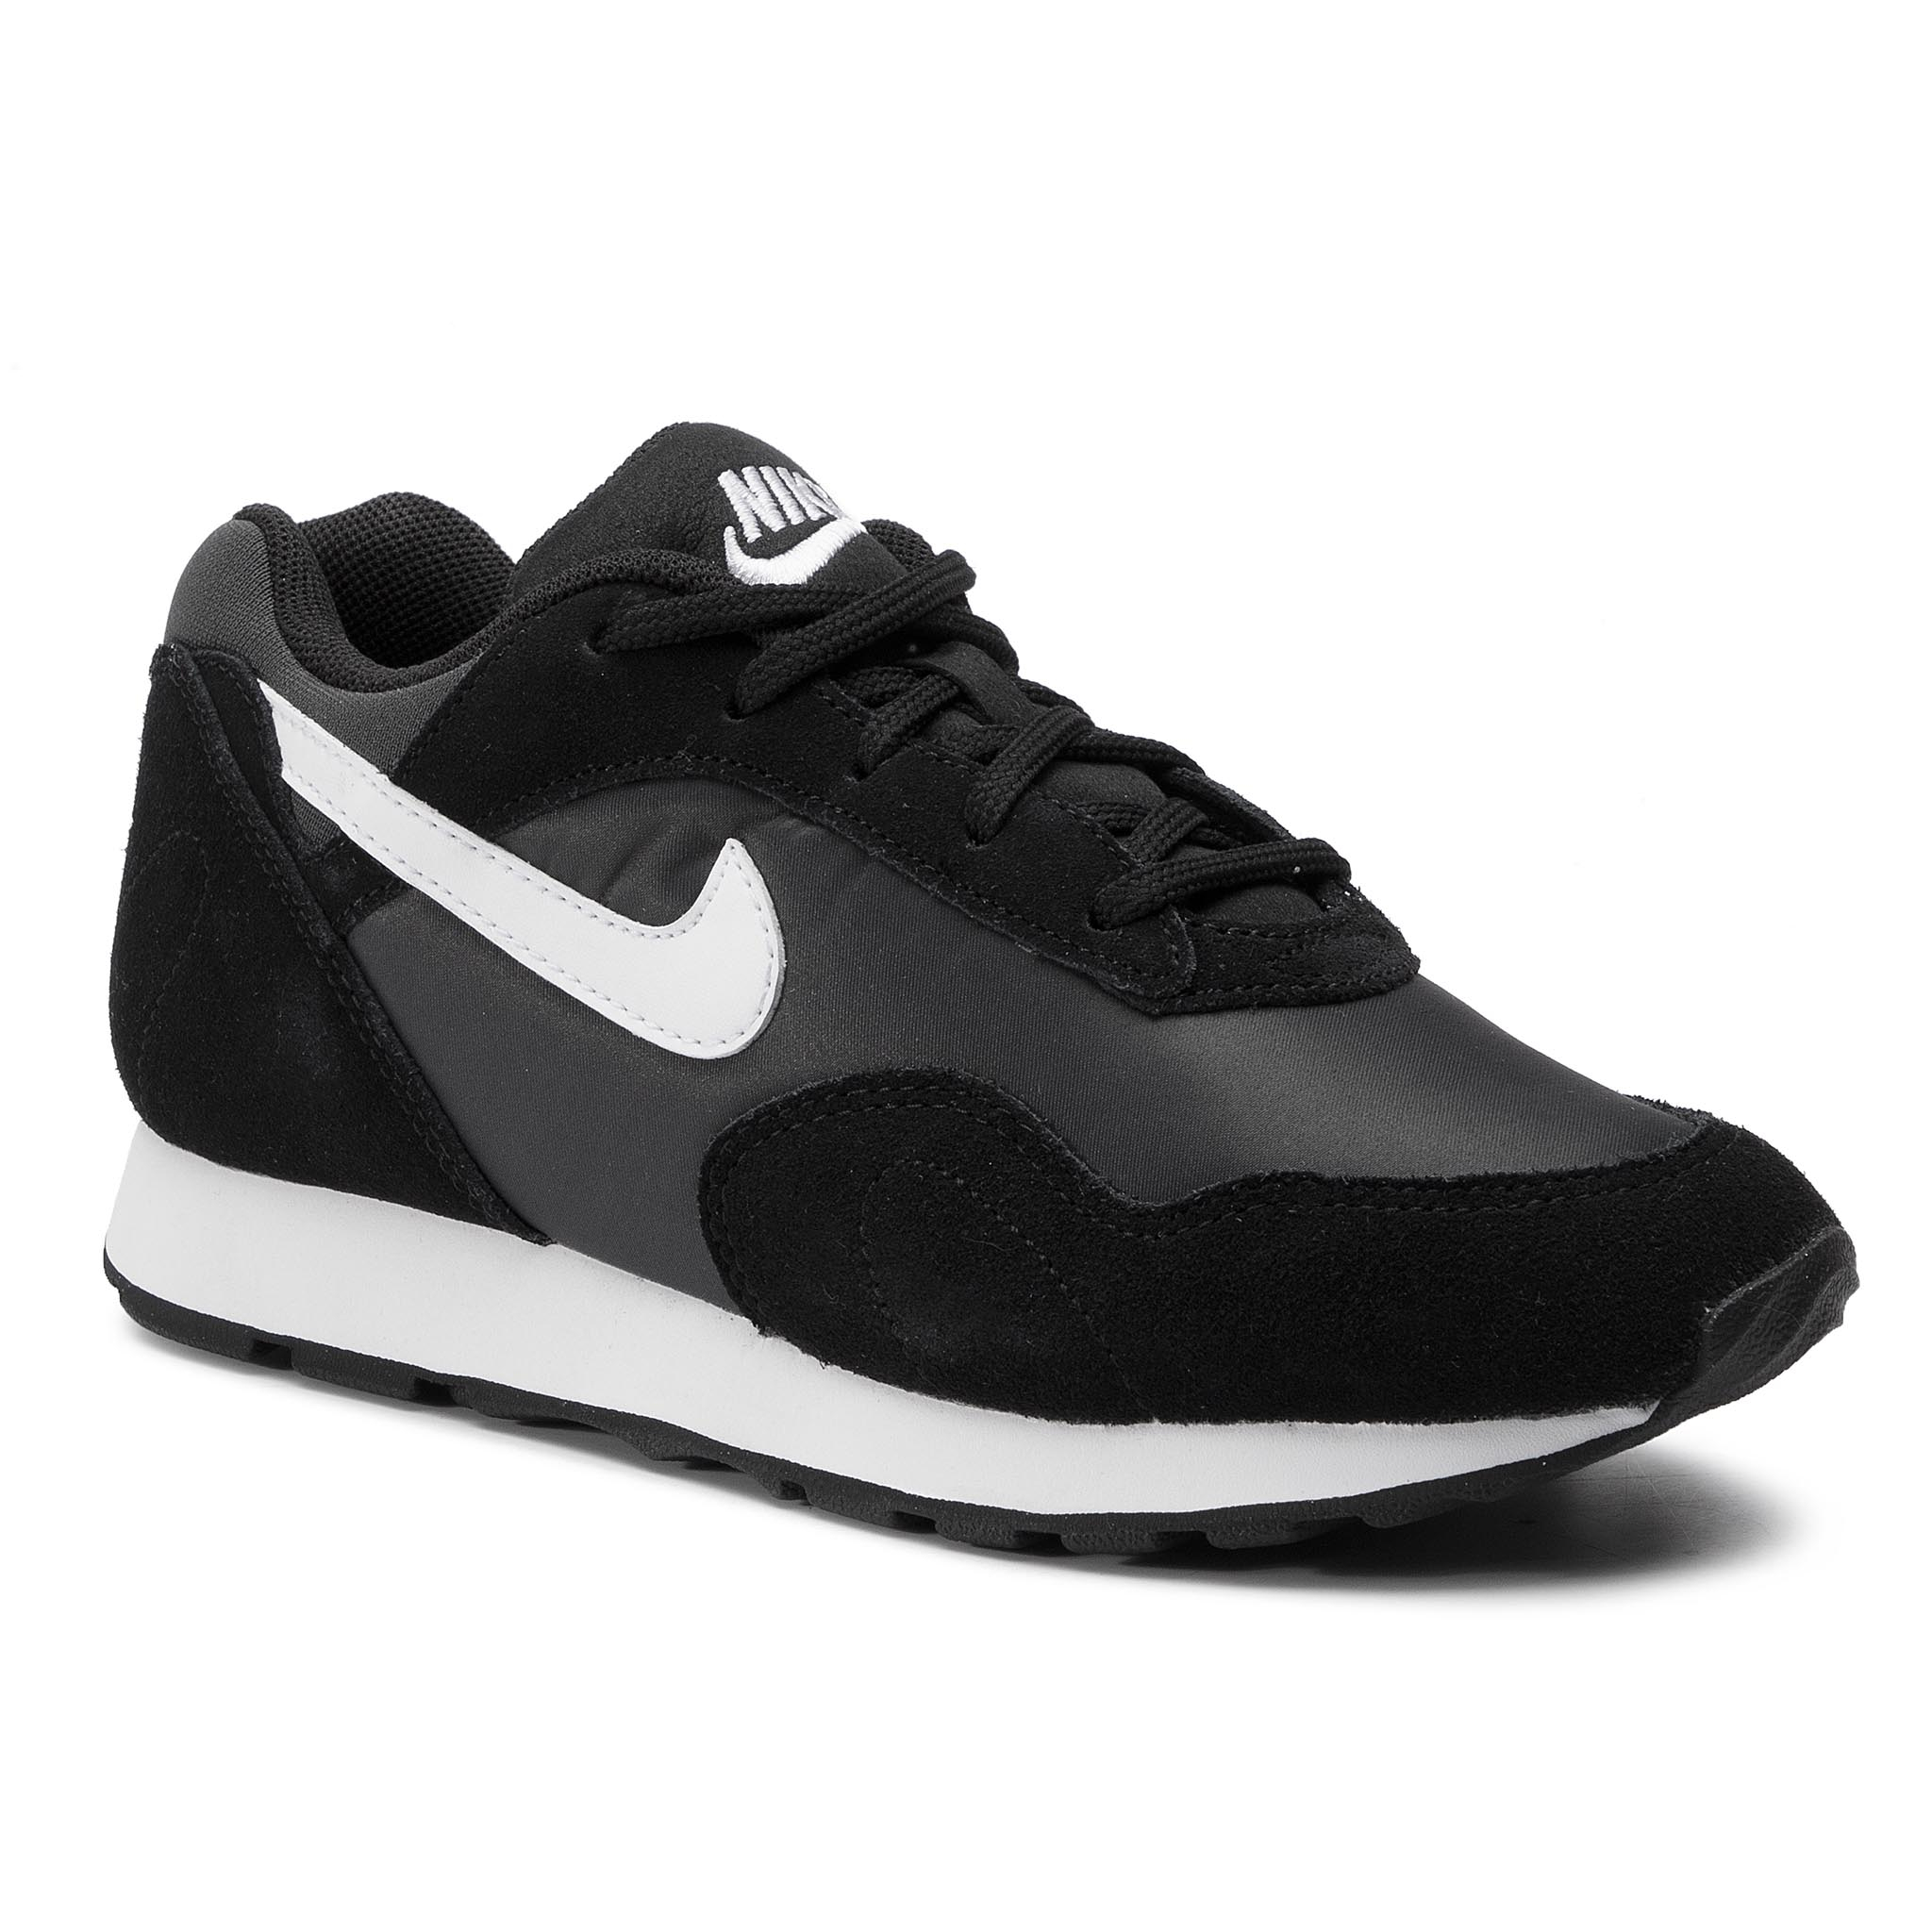 online retailer e342e 4319a Shoes NIKE Outburst AO1069 001 Black White Anthracite